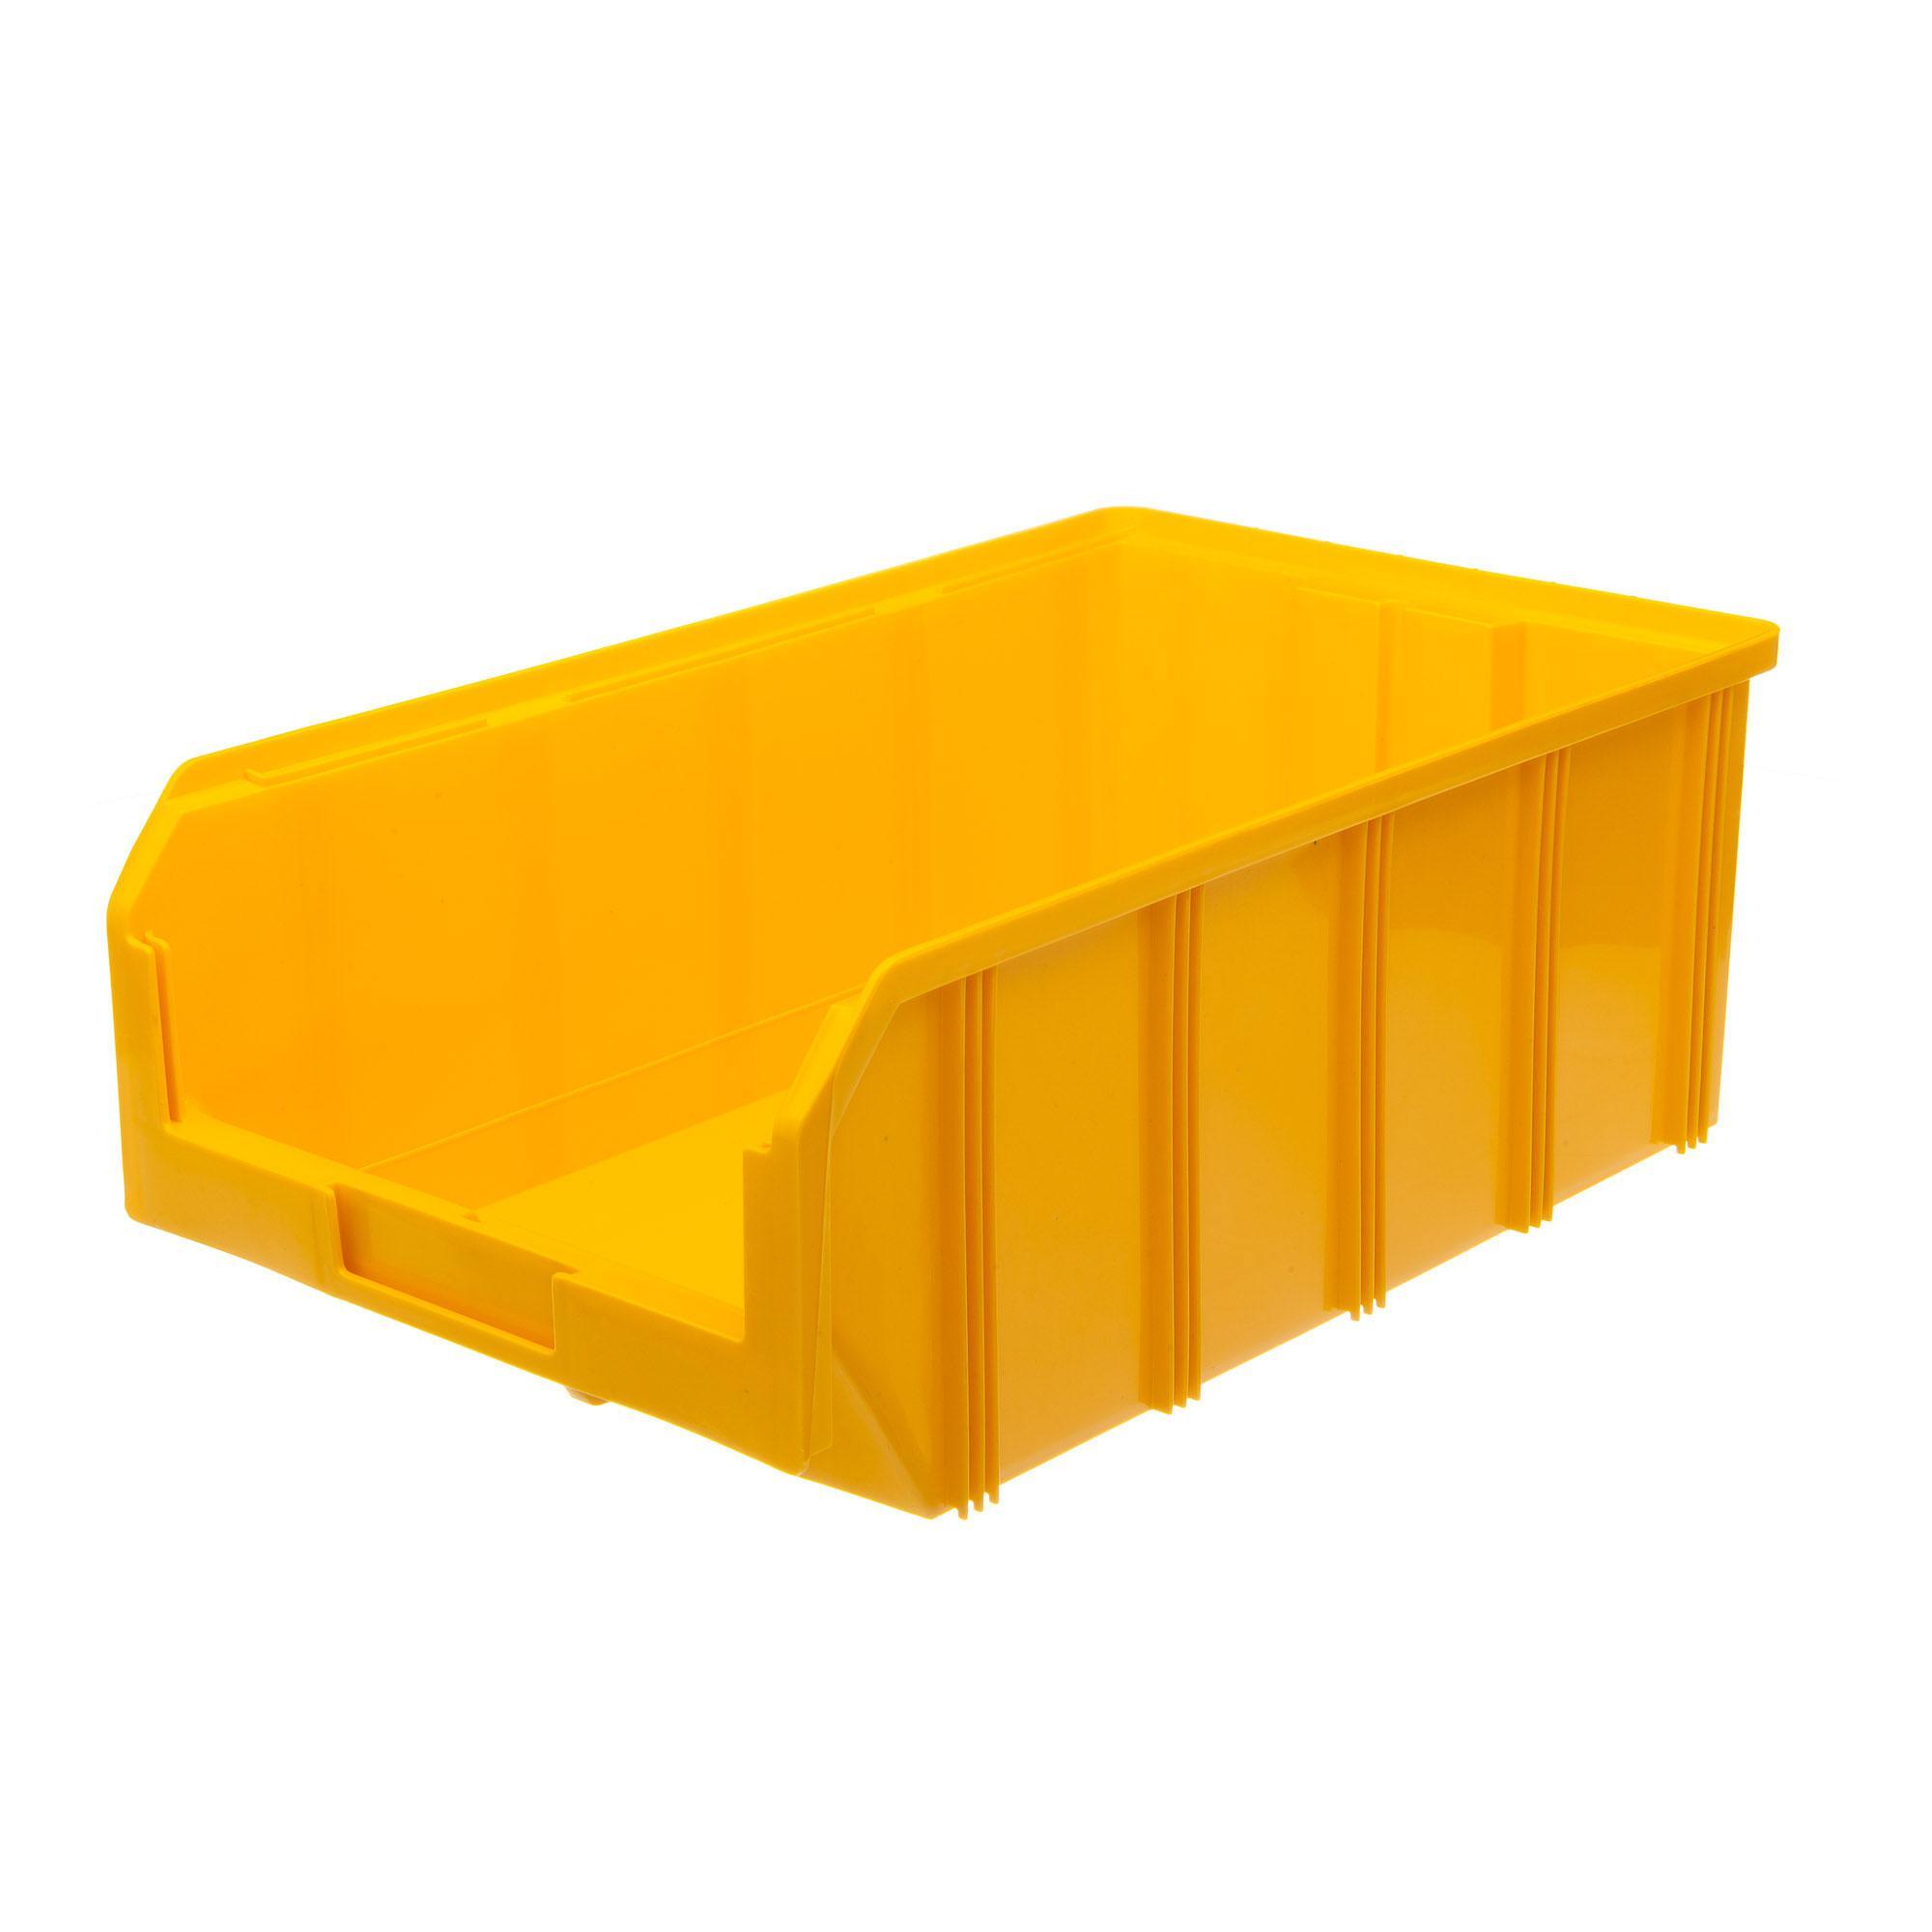 Ящик СТЕЛЛА V-4 желтый b screen b156xw02 v 2 v 0 v 3 v 6 fit b156xtn02 claa156wb11a n156b6 l04 n156b6 l0b bt156gw01 n156bge l21 lp156wh4 tla1 tlc1 b1